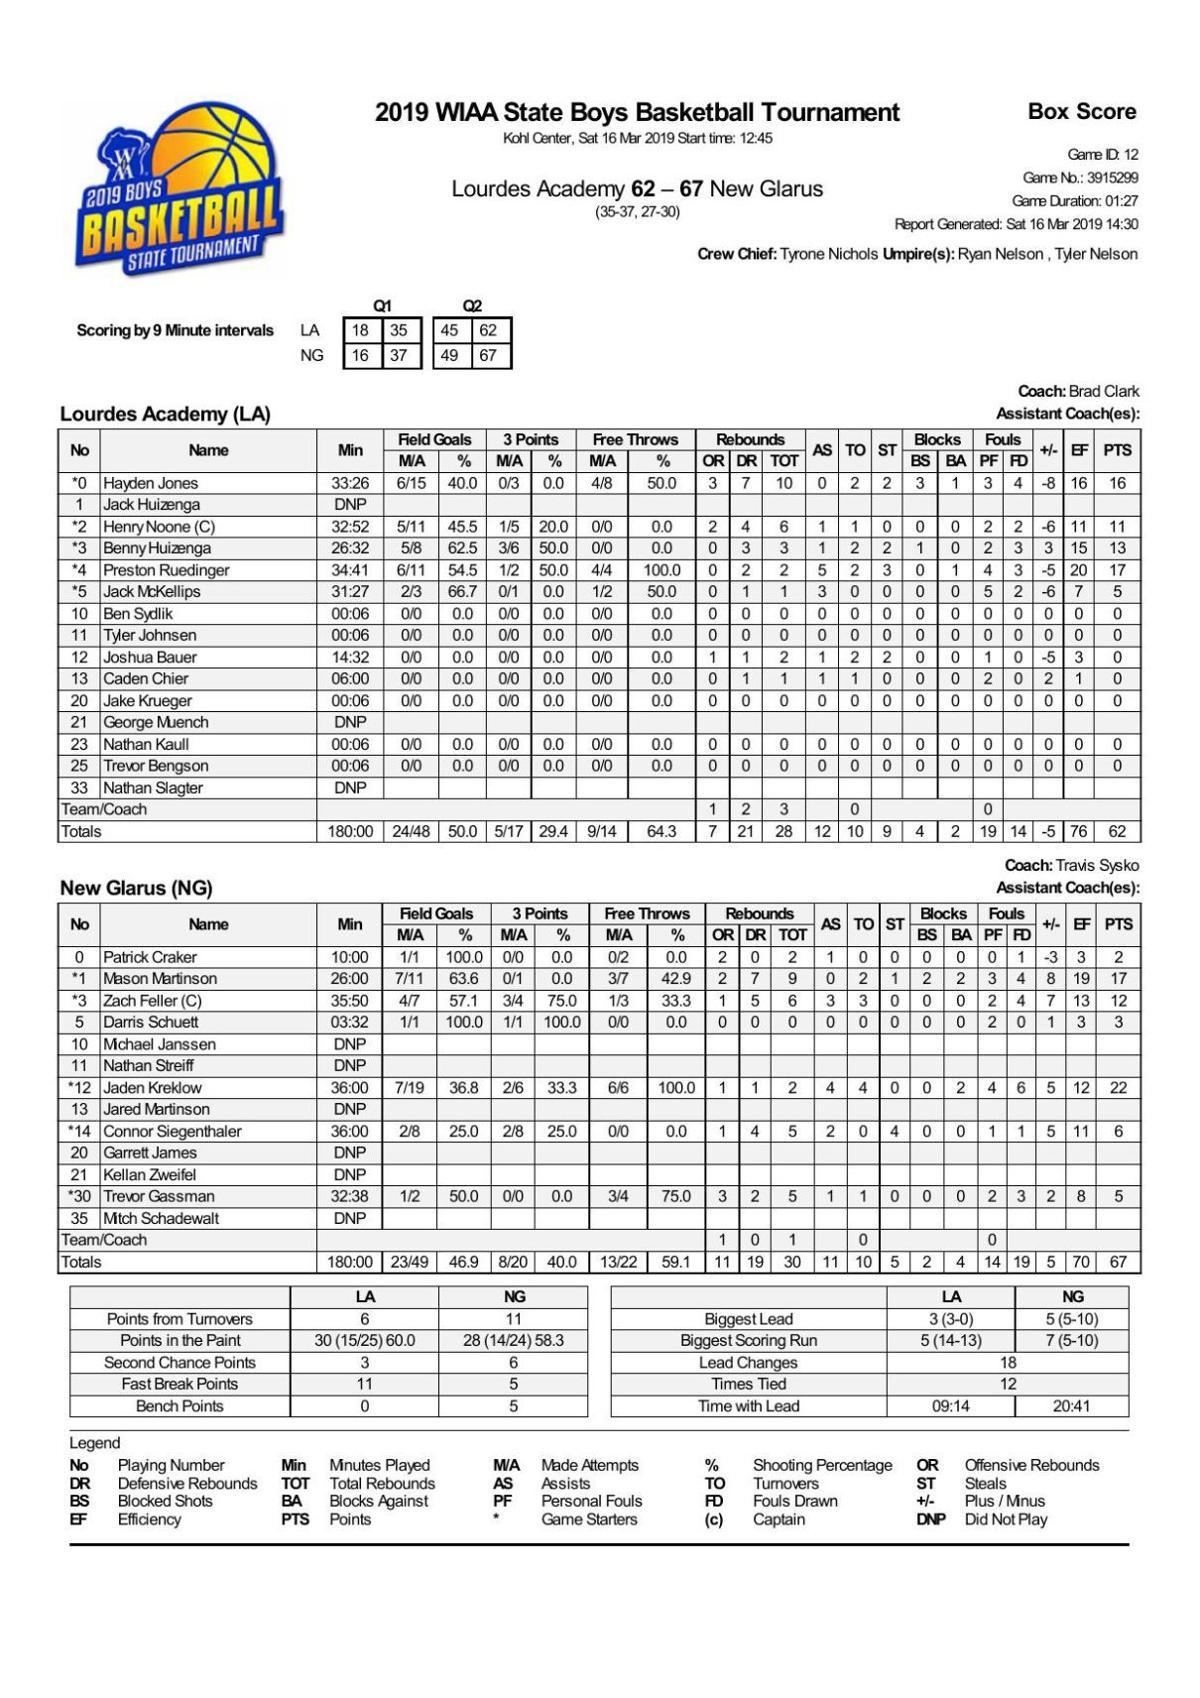 Official box score, play by play: New Glarus 67, Oshkosh Lourdes 62